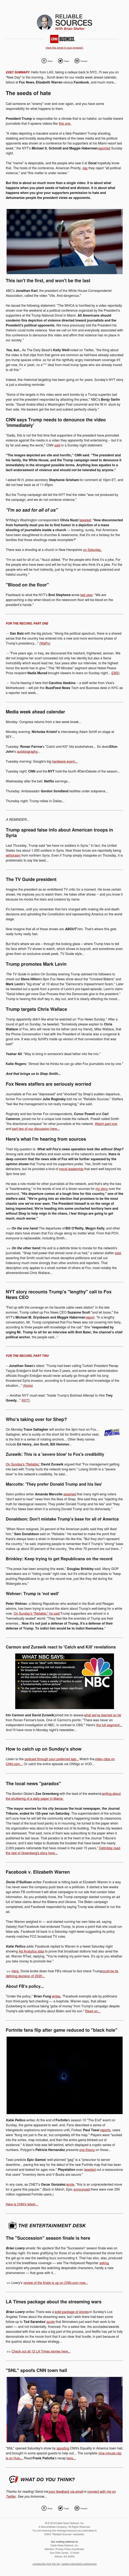 Vile anti-media video; seeds of hate; WHCA's reaction; the TV Guide president; Fox after Shep; week ahead calendar; 'Succession' season finale